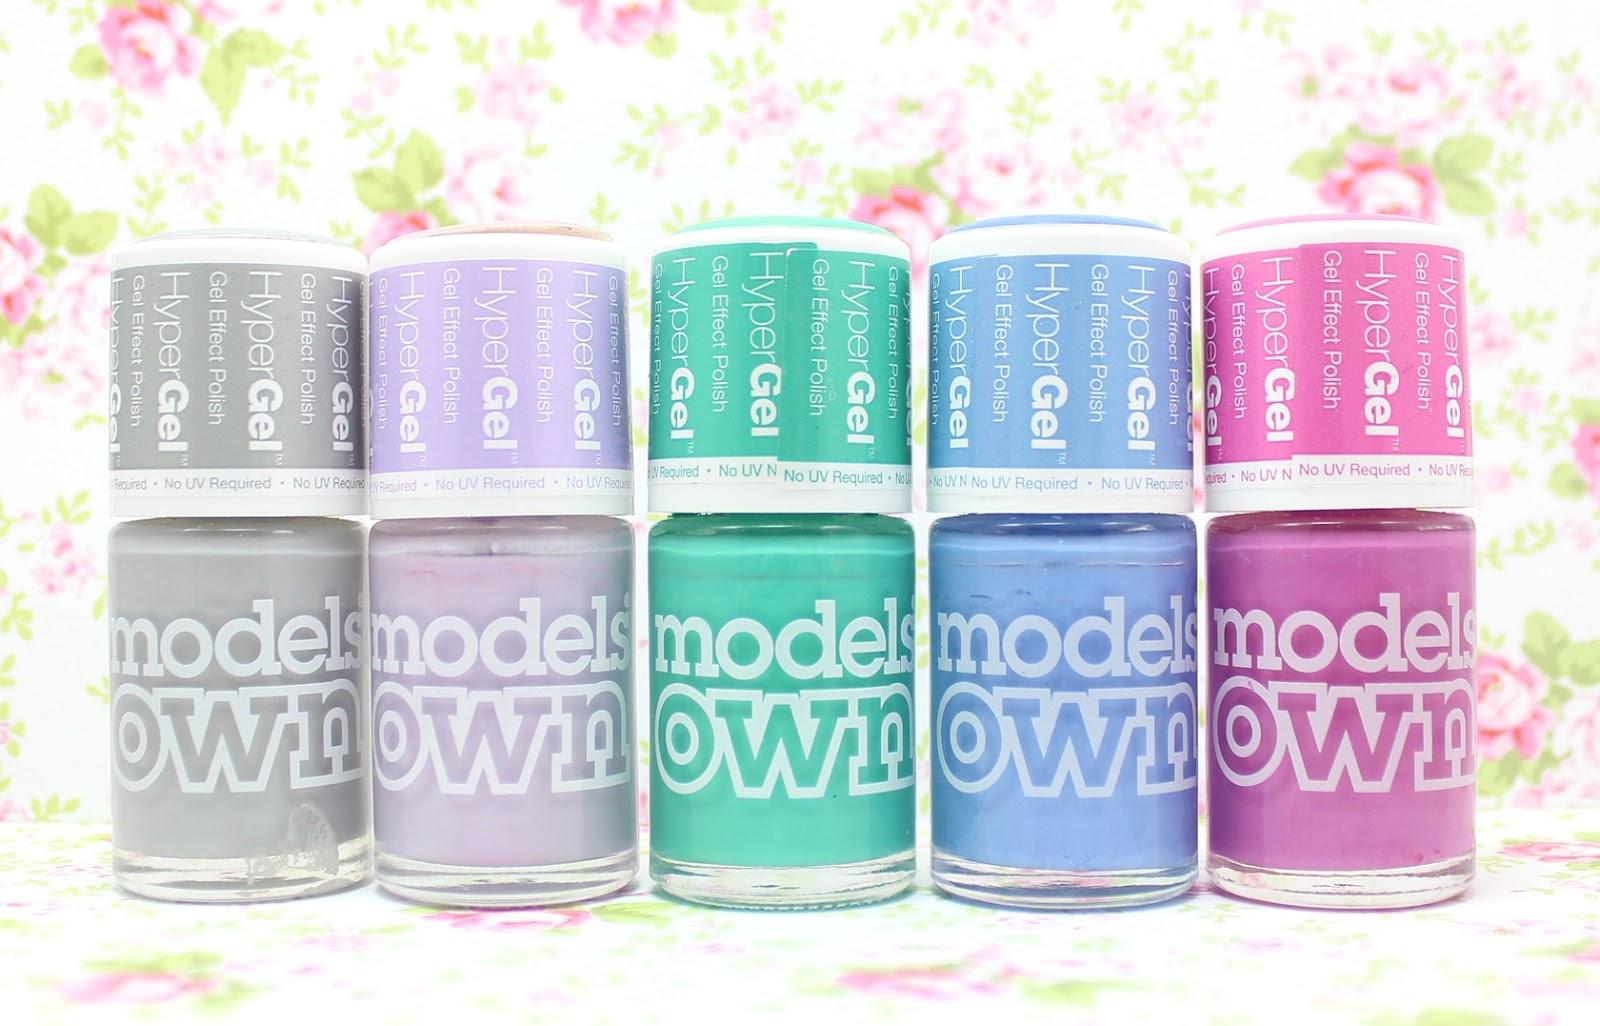 Models Own Hypergel Polishes